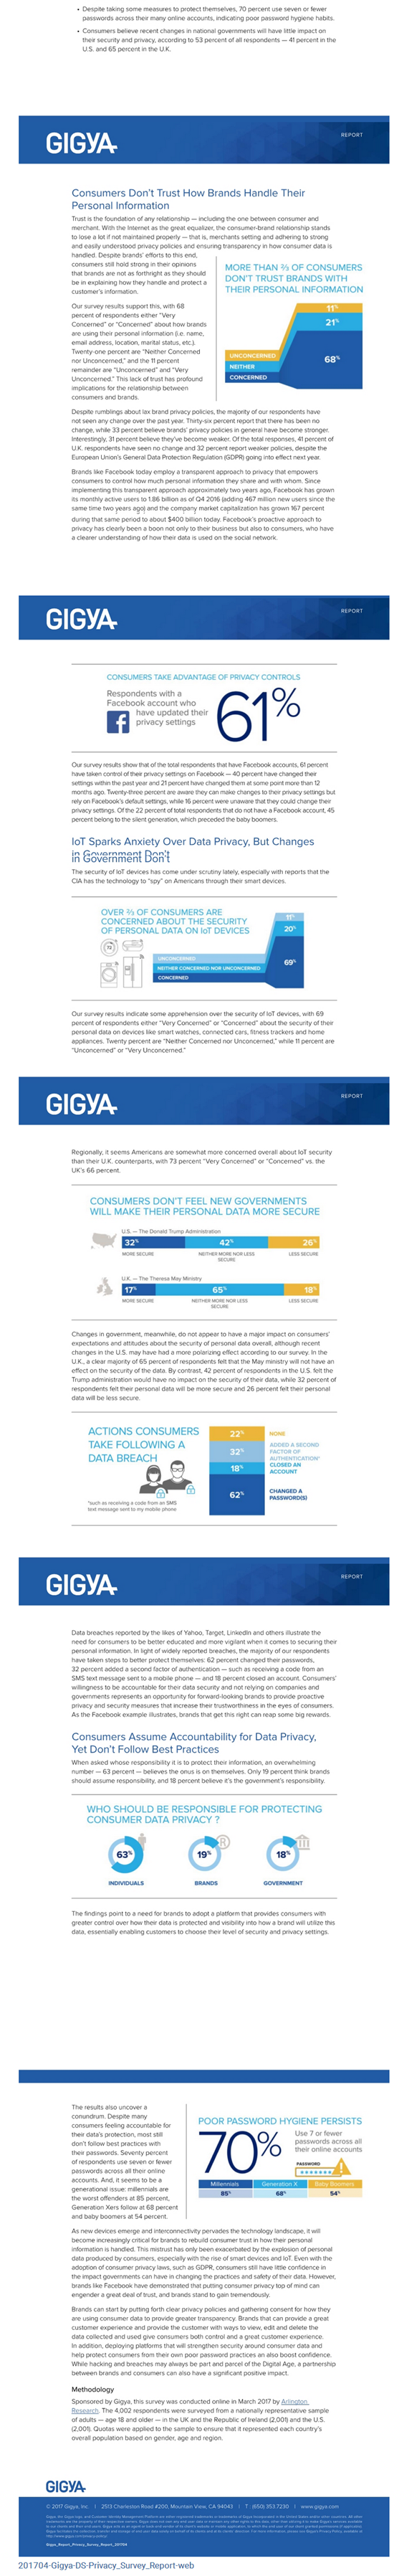 Gigya:《2017年消费者对隐私和安全态度报告》(全文)